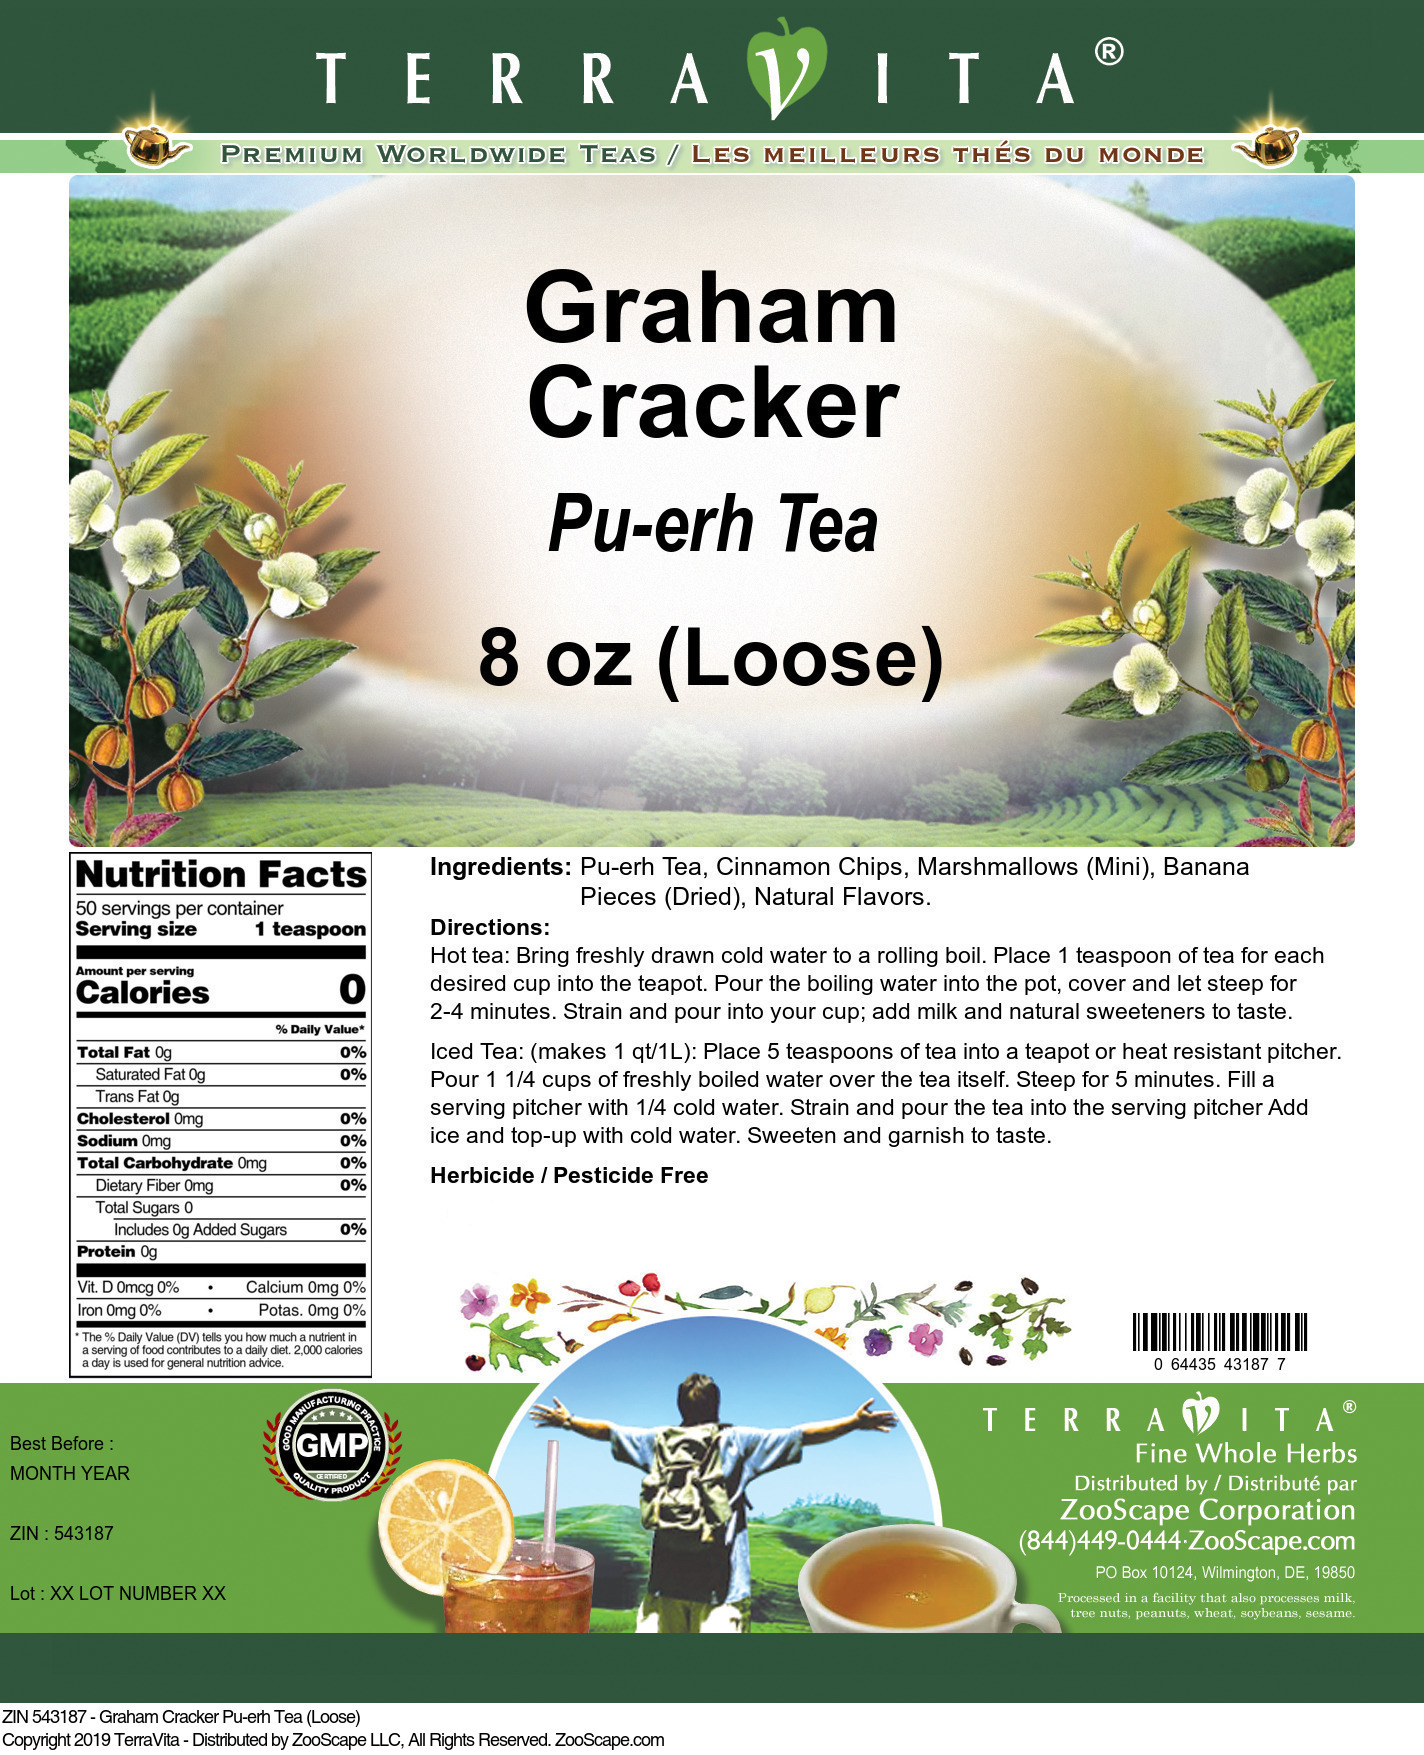 Graham Cracker Pu-erh Tea (Loose)